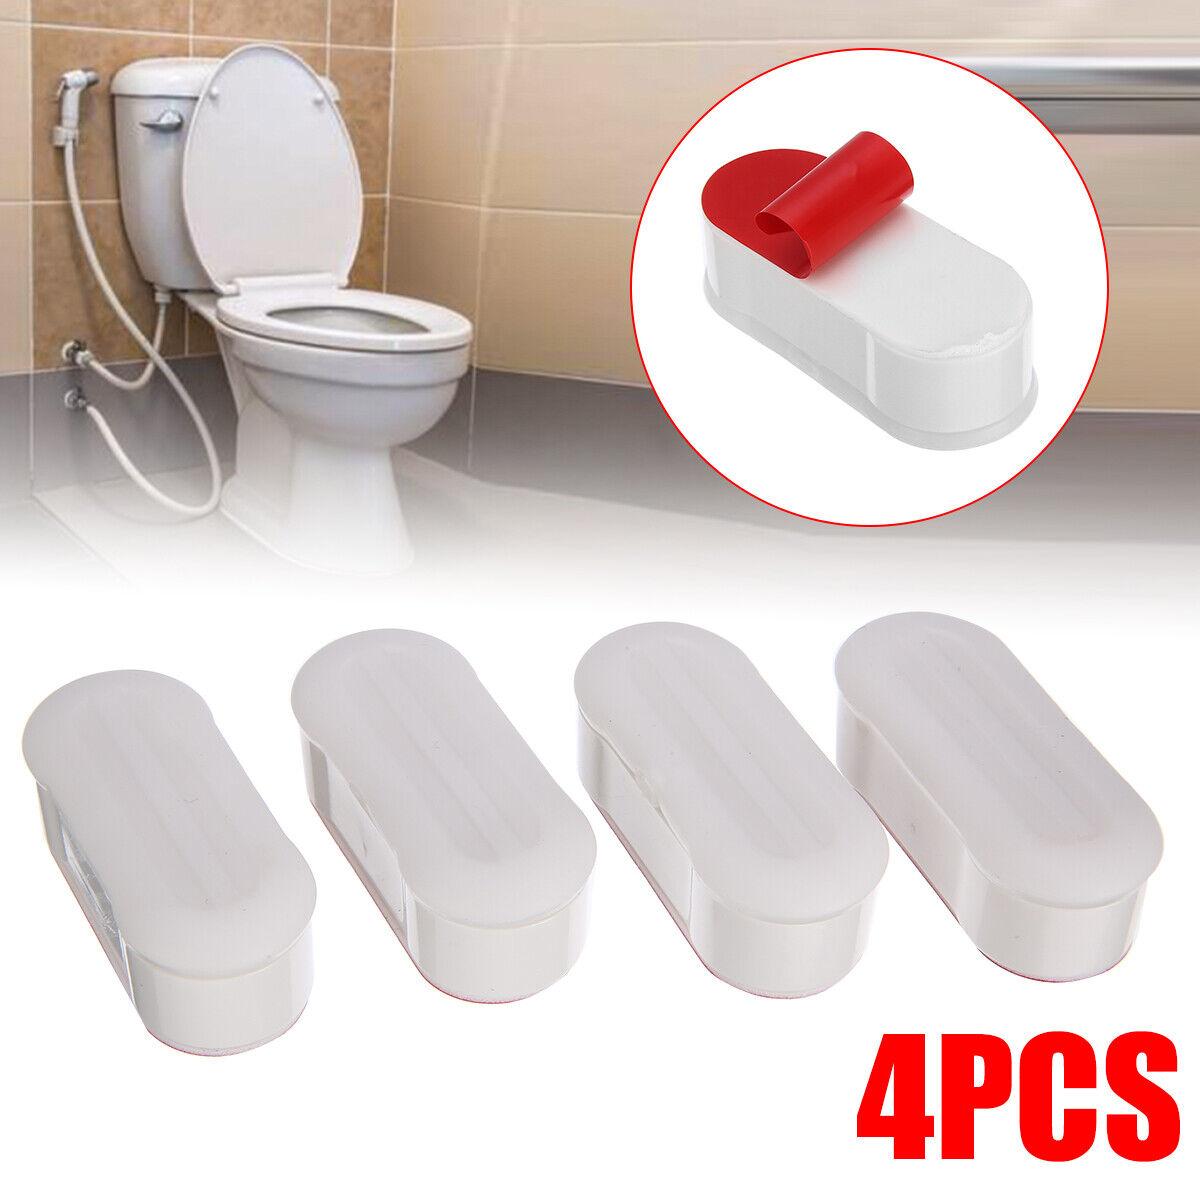 4PCS Toilet Seats Buffers Bumper Adhesive Strip Pads Universal For Bathroom